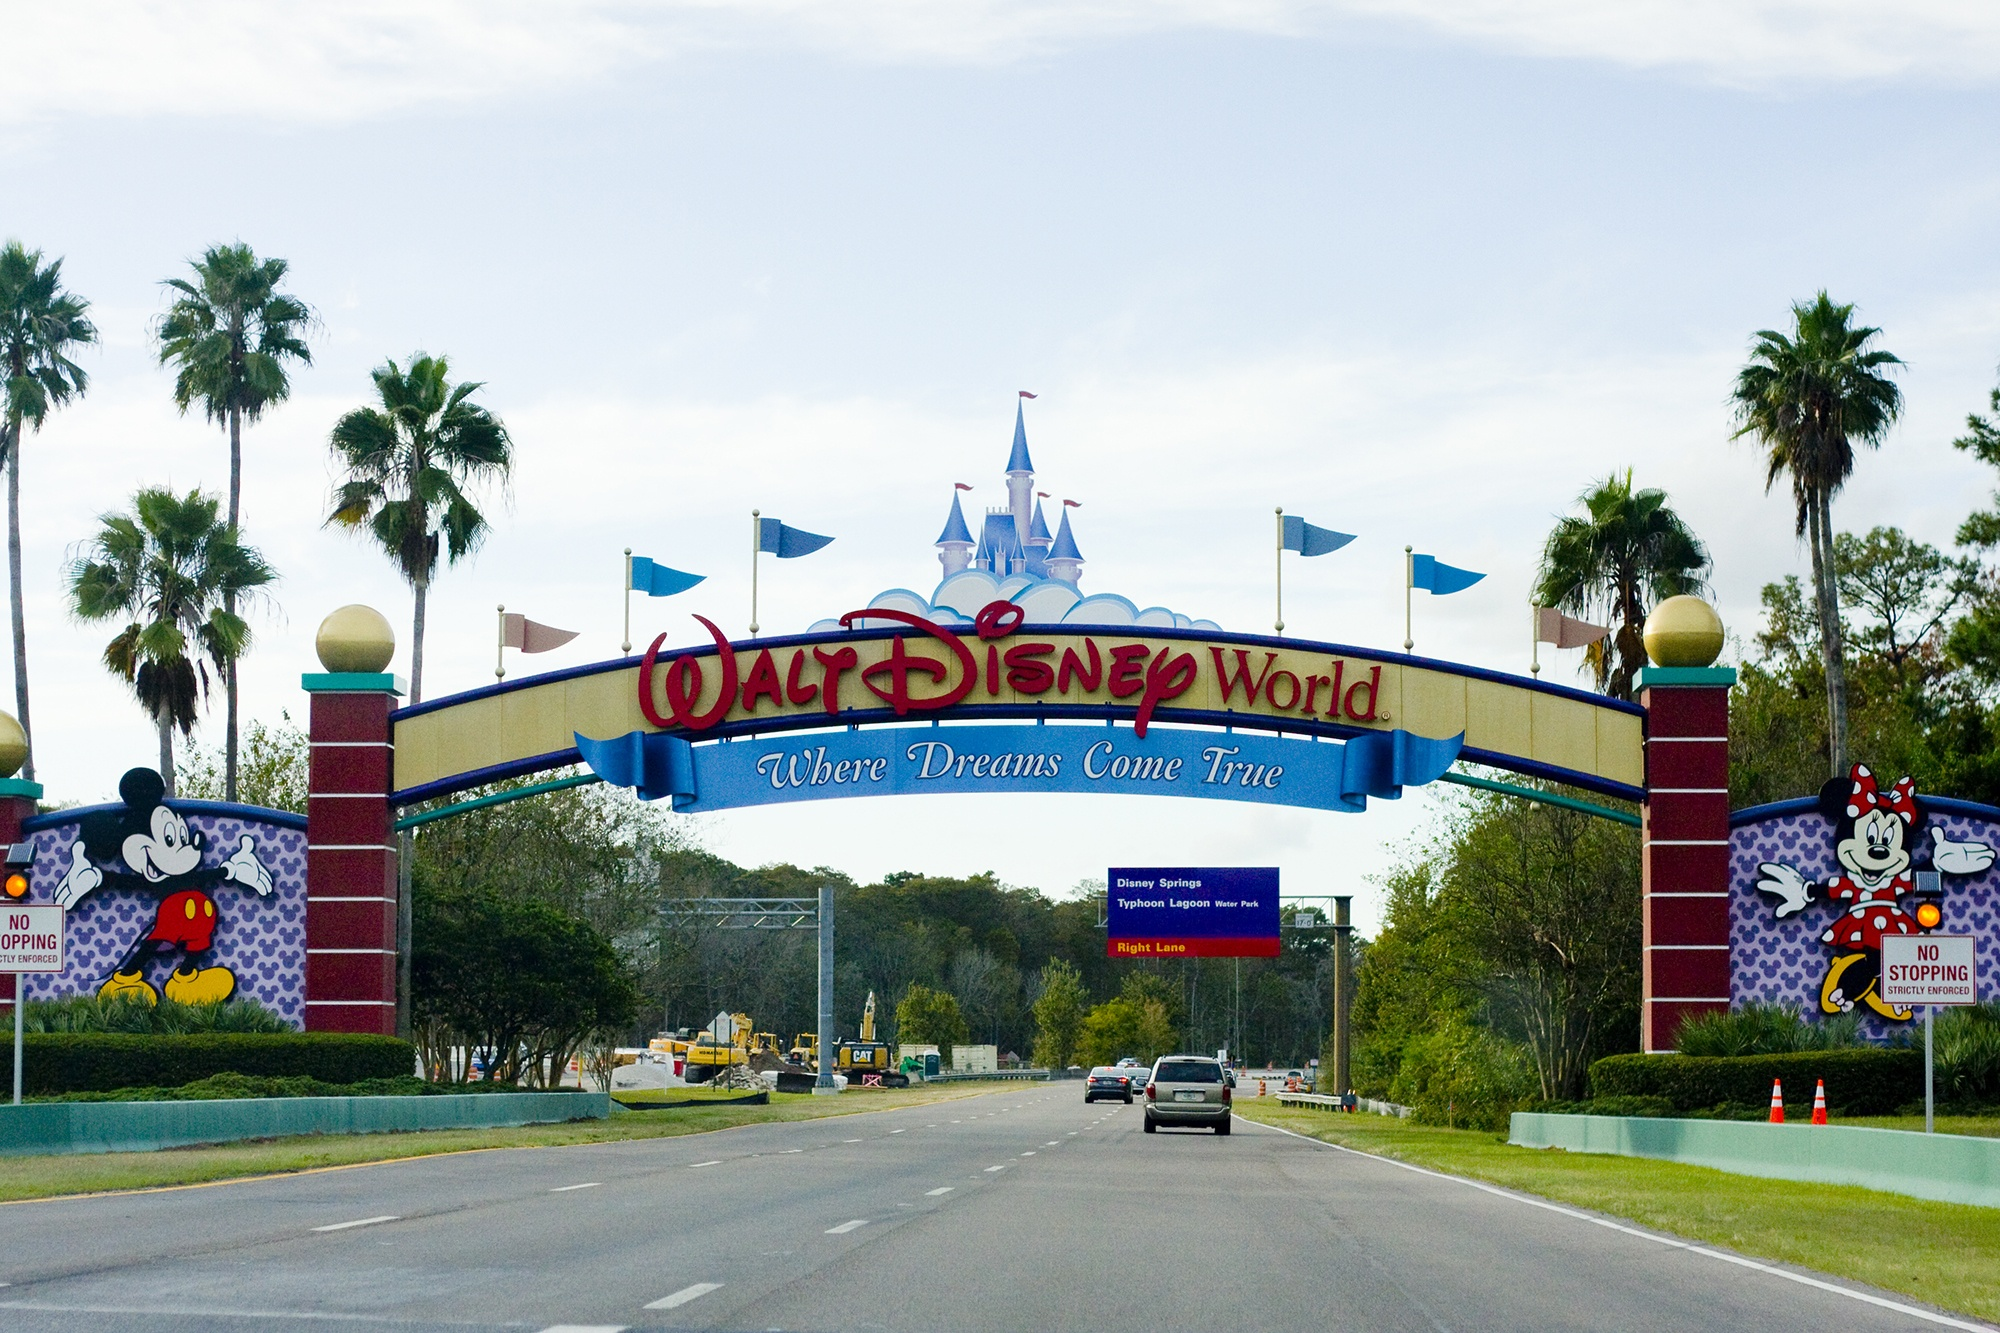 New York Rangers Wallpaper Hd Disney Possibly Planning Gondola Network At Orlando Resort